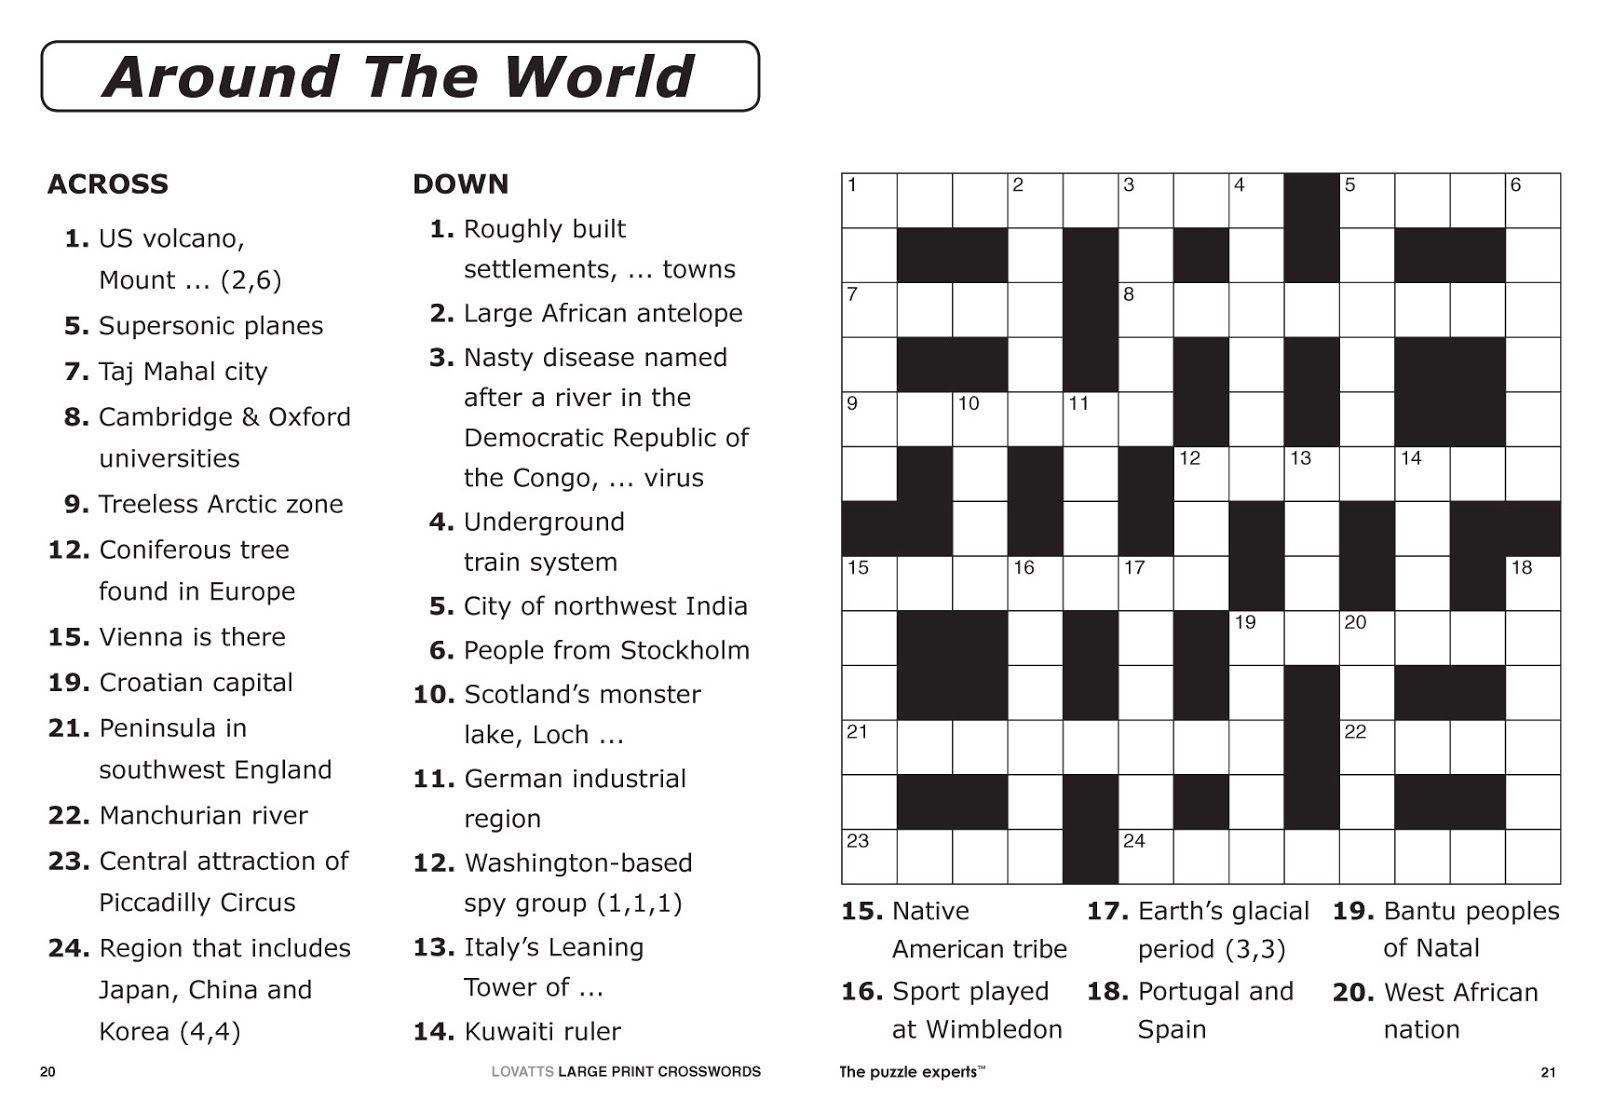 Free Printable Large Print Crossword Puzzles | M3U8 - Free Printable Puzzles